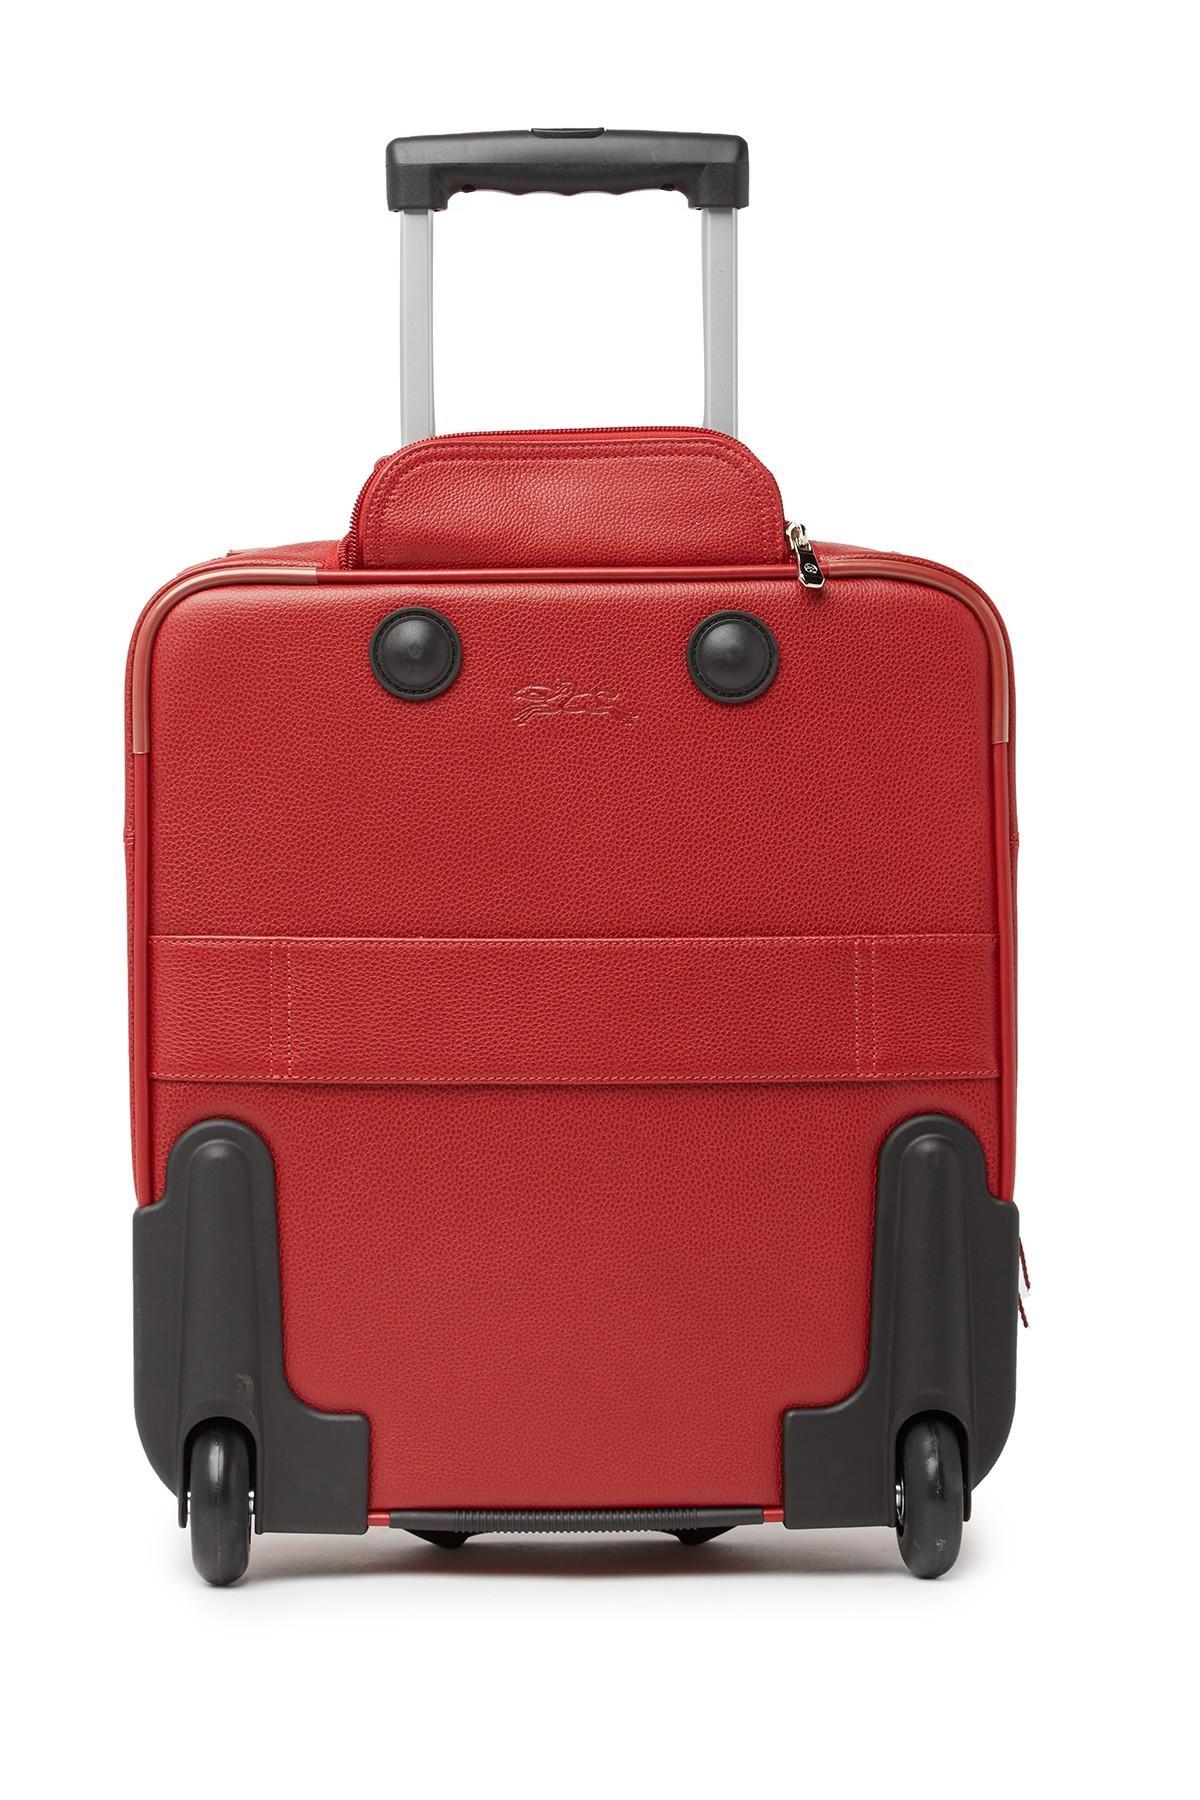 341b5148a Longchamp Vp Board Trolley Duffle Bag in Red - Lyst